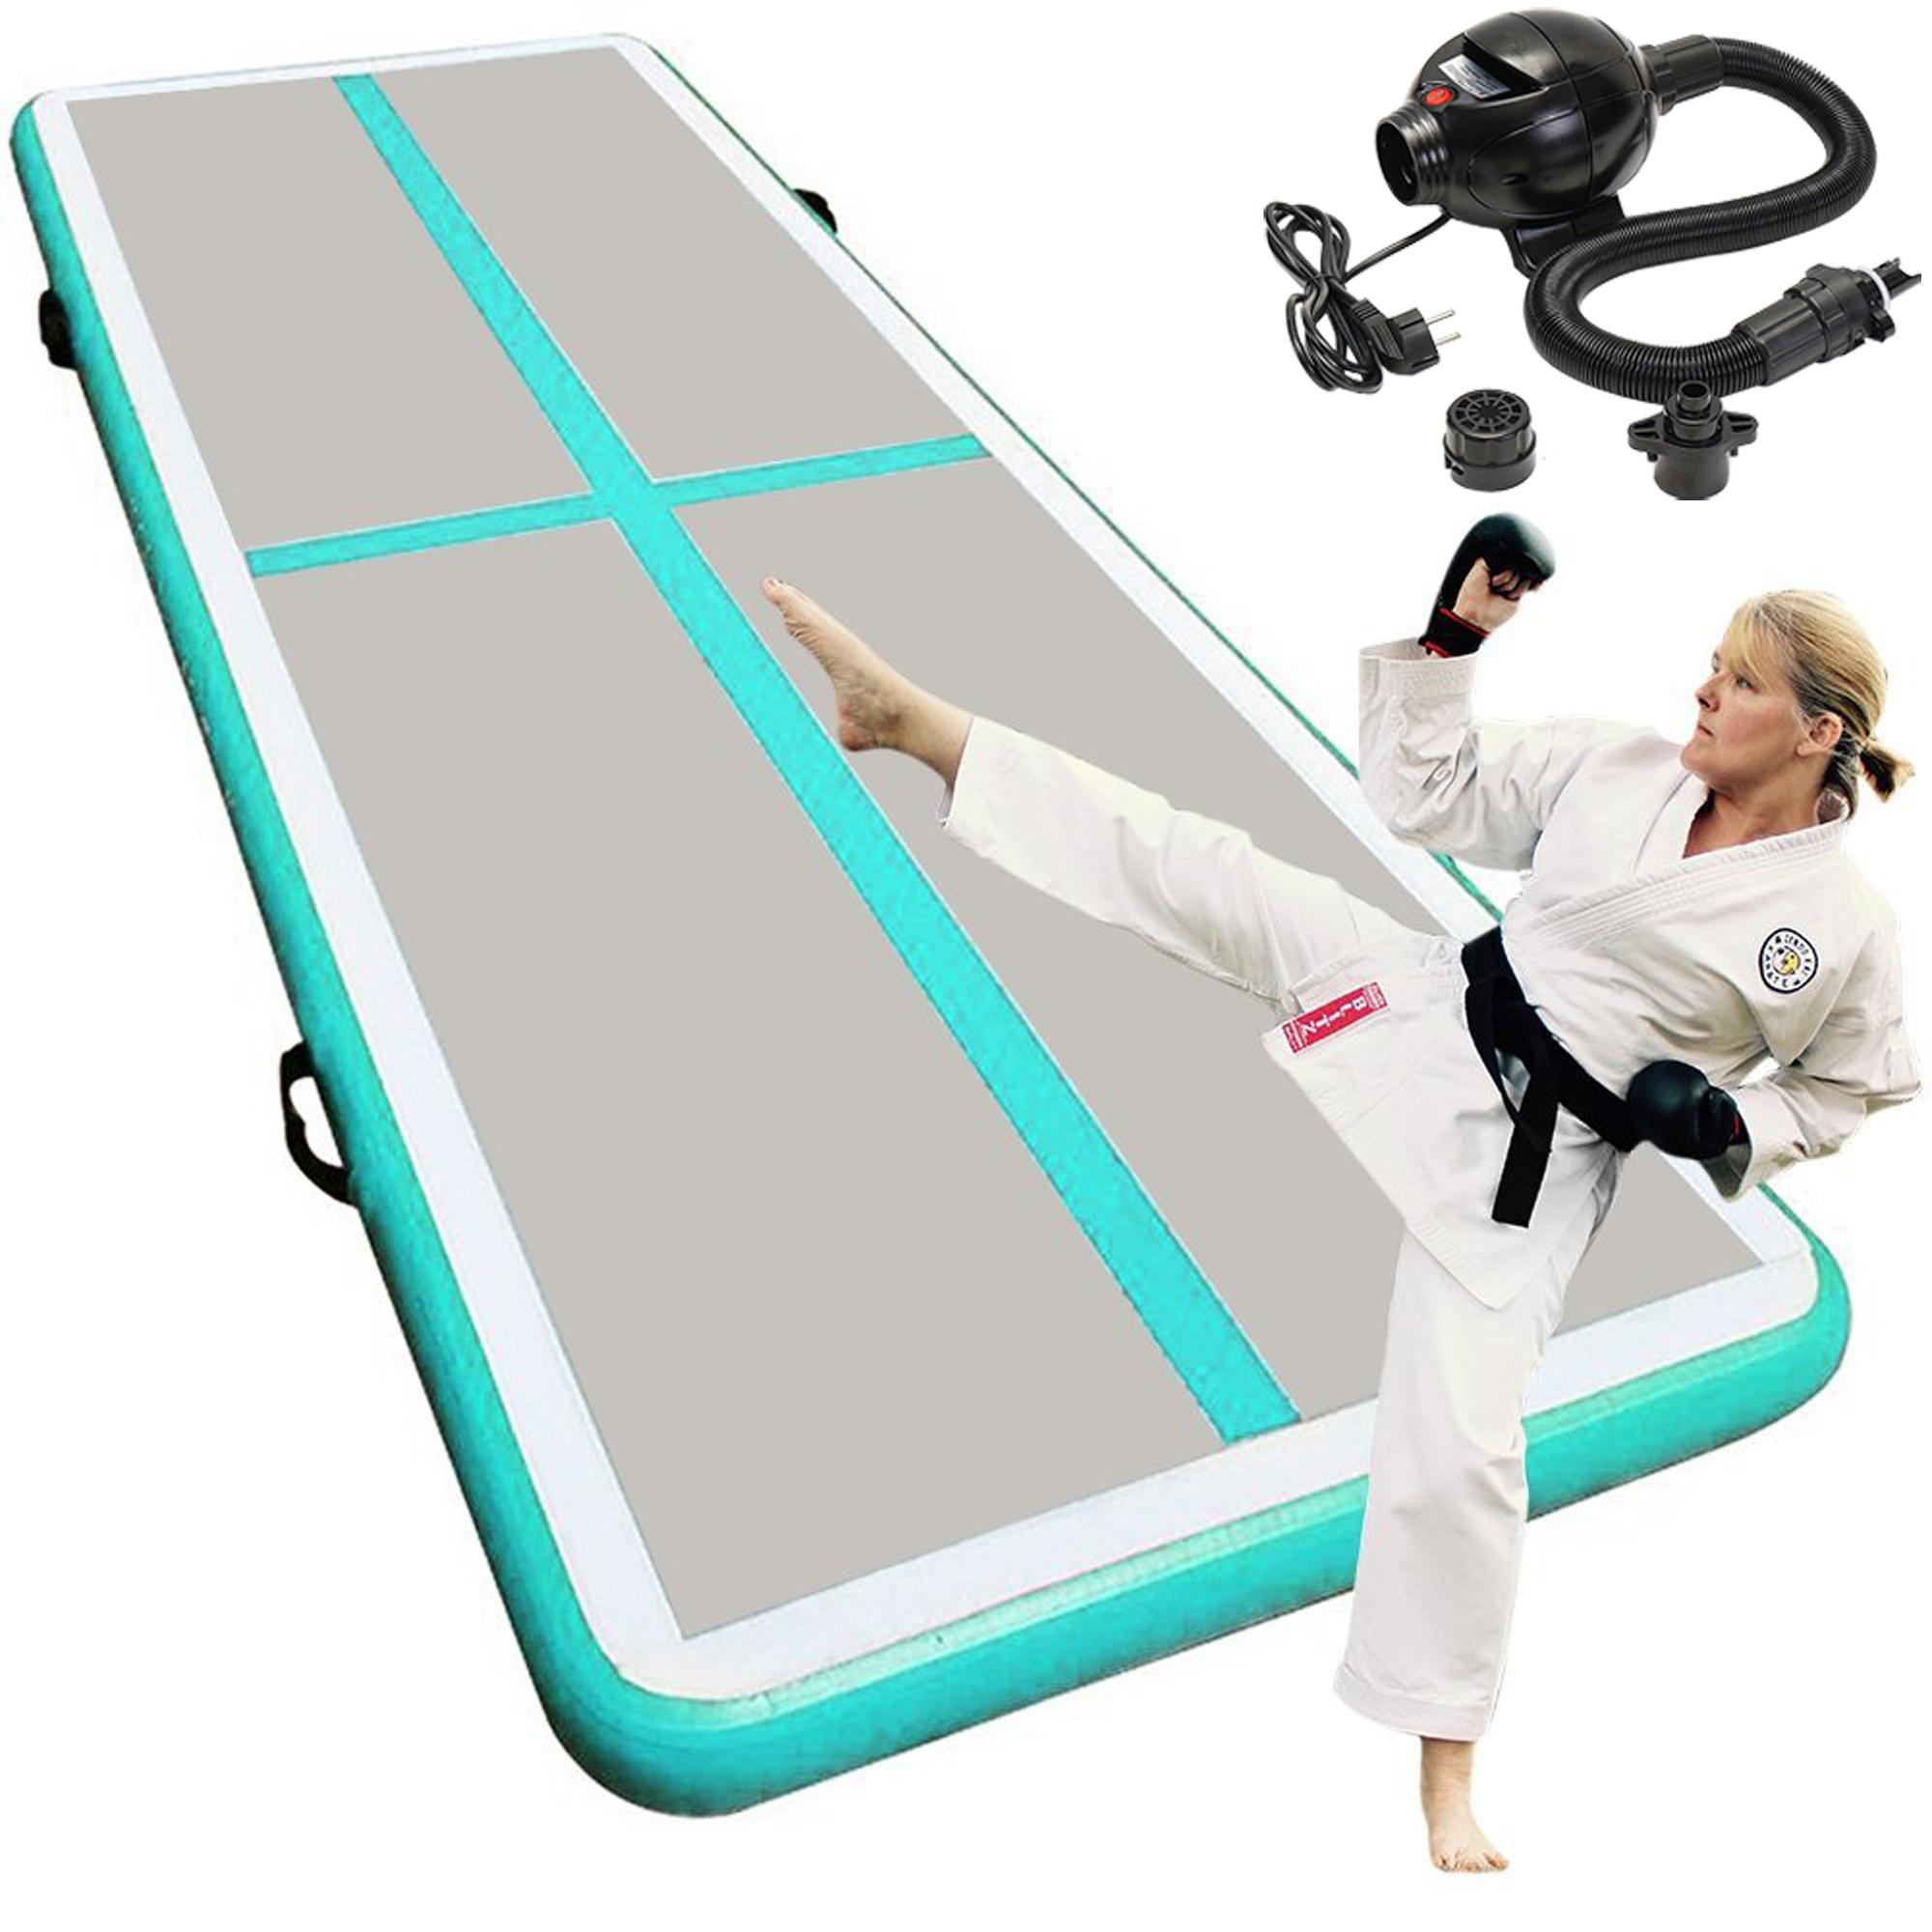 "TINTON LIFE 118"" Inflatable Gymnastic Yoga Pad Air Track Floor Airtrack Tumbling Yoga Mat For Home Use, Gymnastics Training, Beach, Taekwondo, Cheerleading With Electric Air Pump (Lake Blue)"